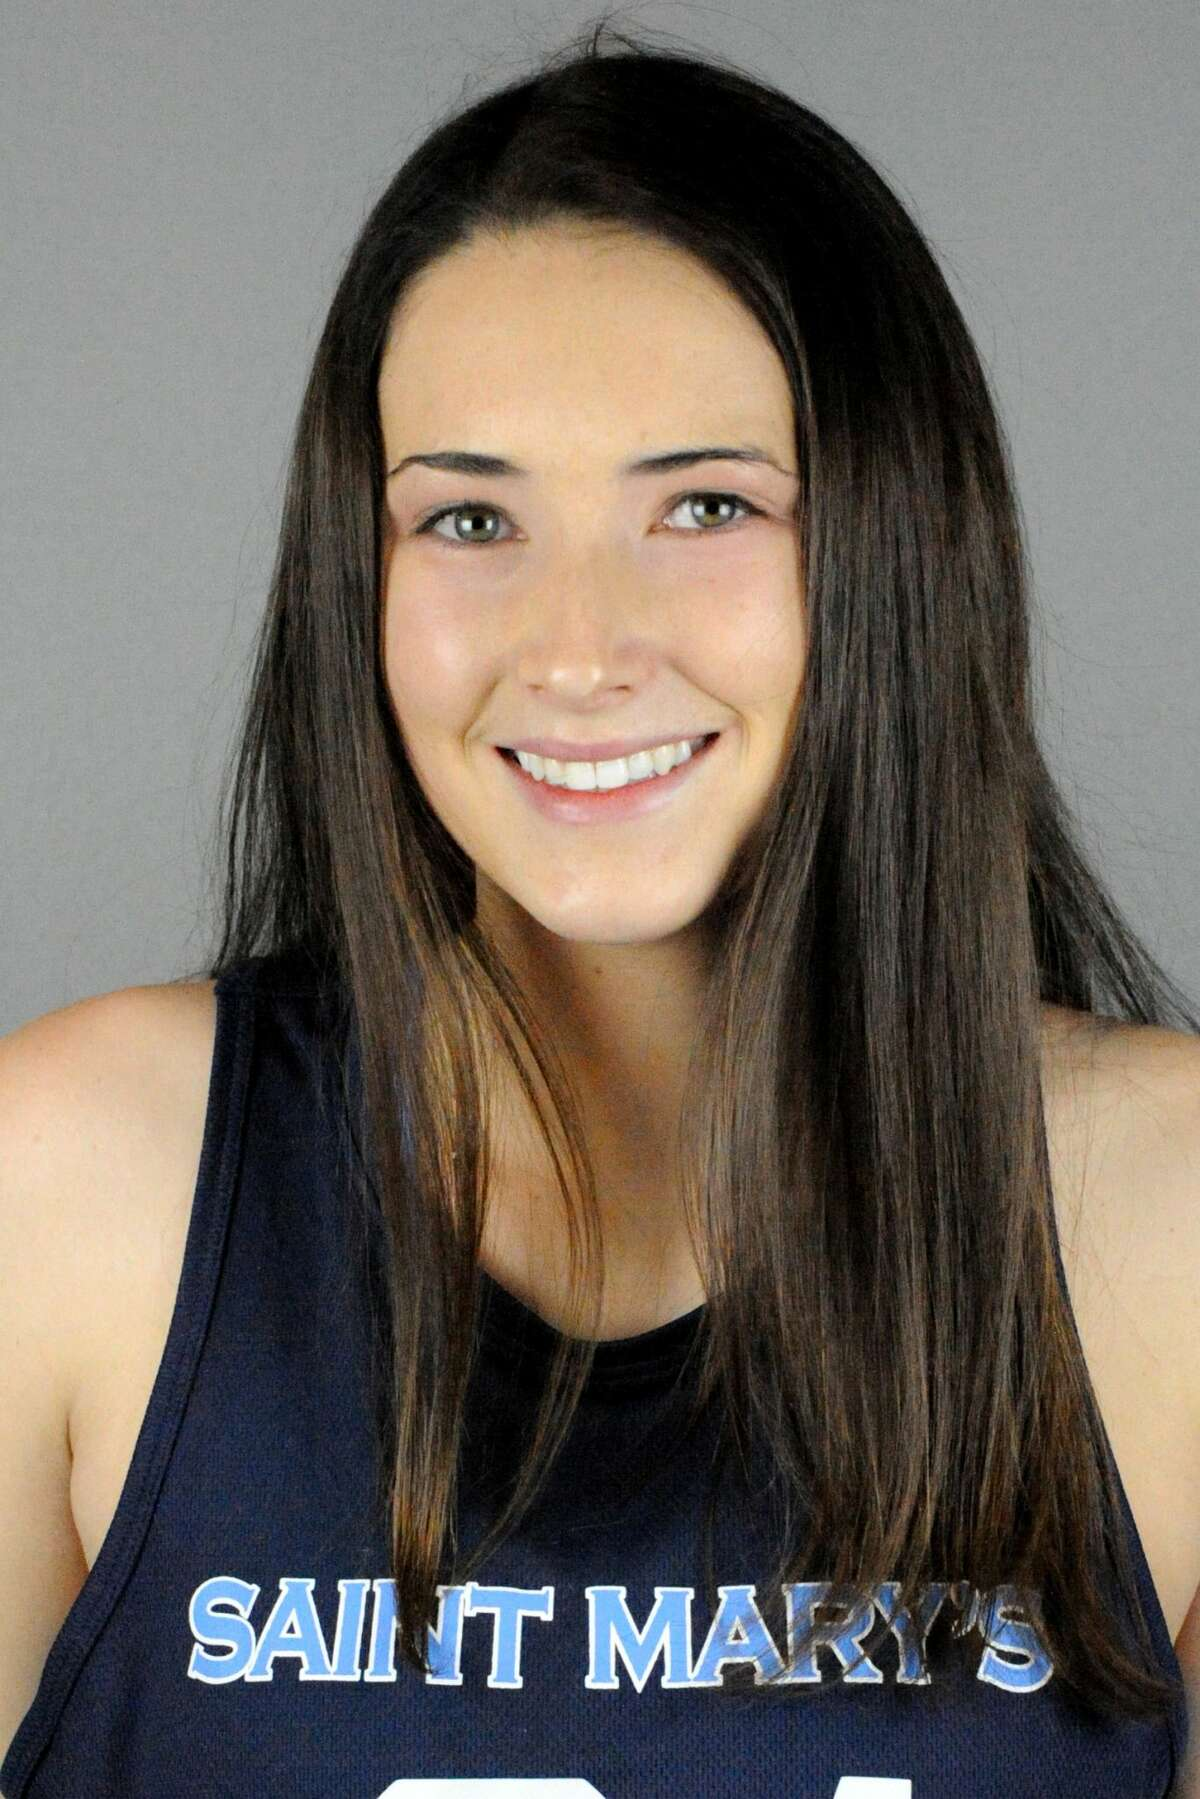 Niskayuna High graduate Erin Doyle of the St. Mary's College women's lacrosse team. (Courtesy of Saint Mary's Athletics)